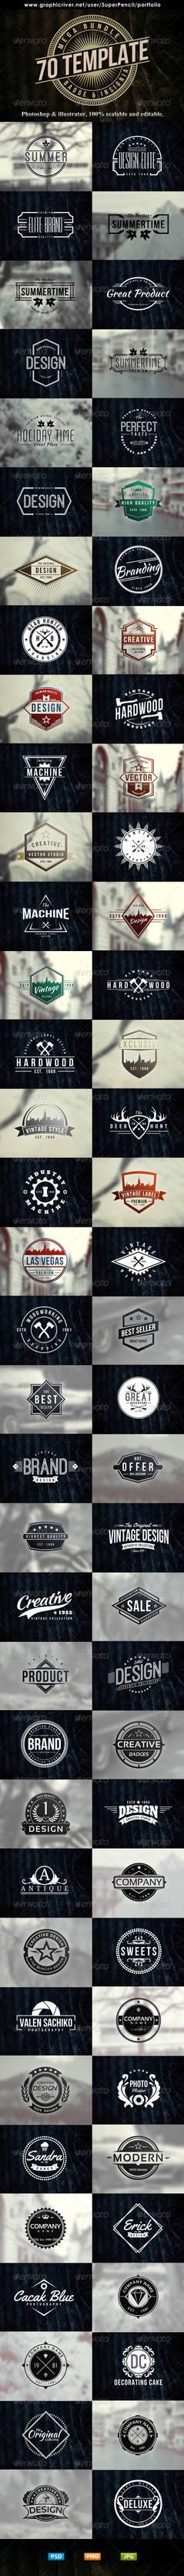 70 Logo | Badge | Insignia Templates Bundle